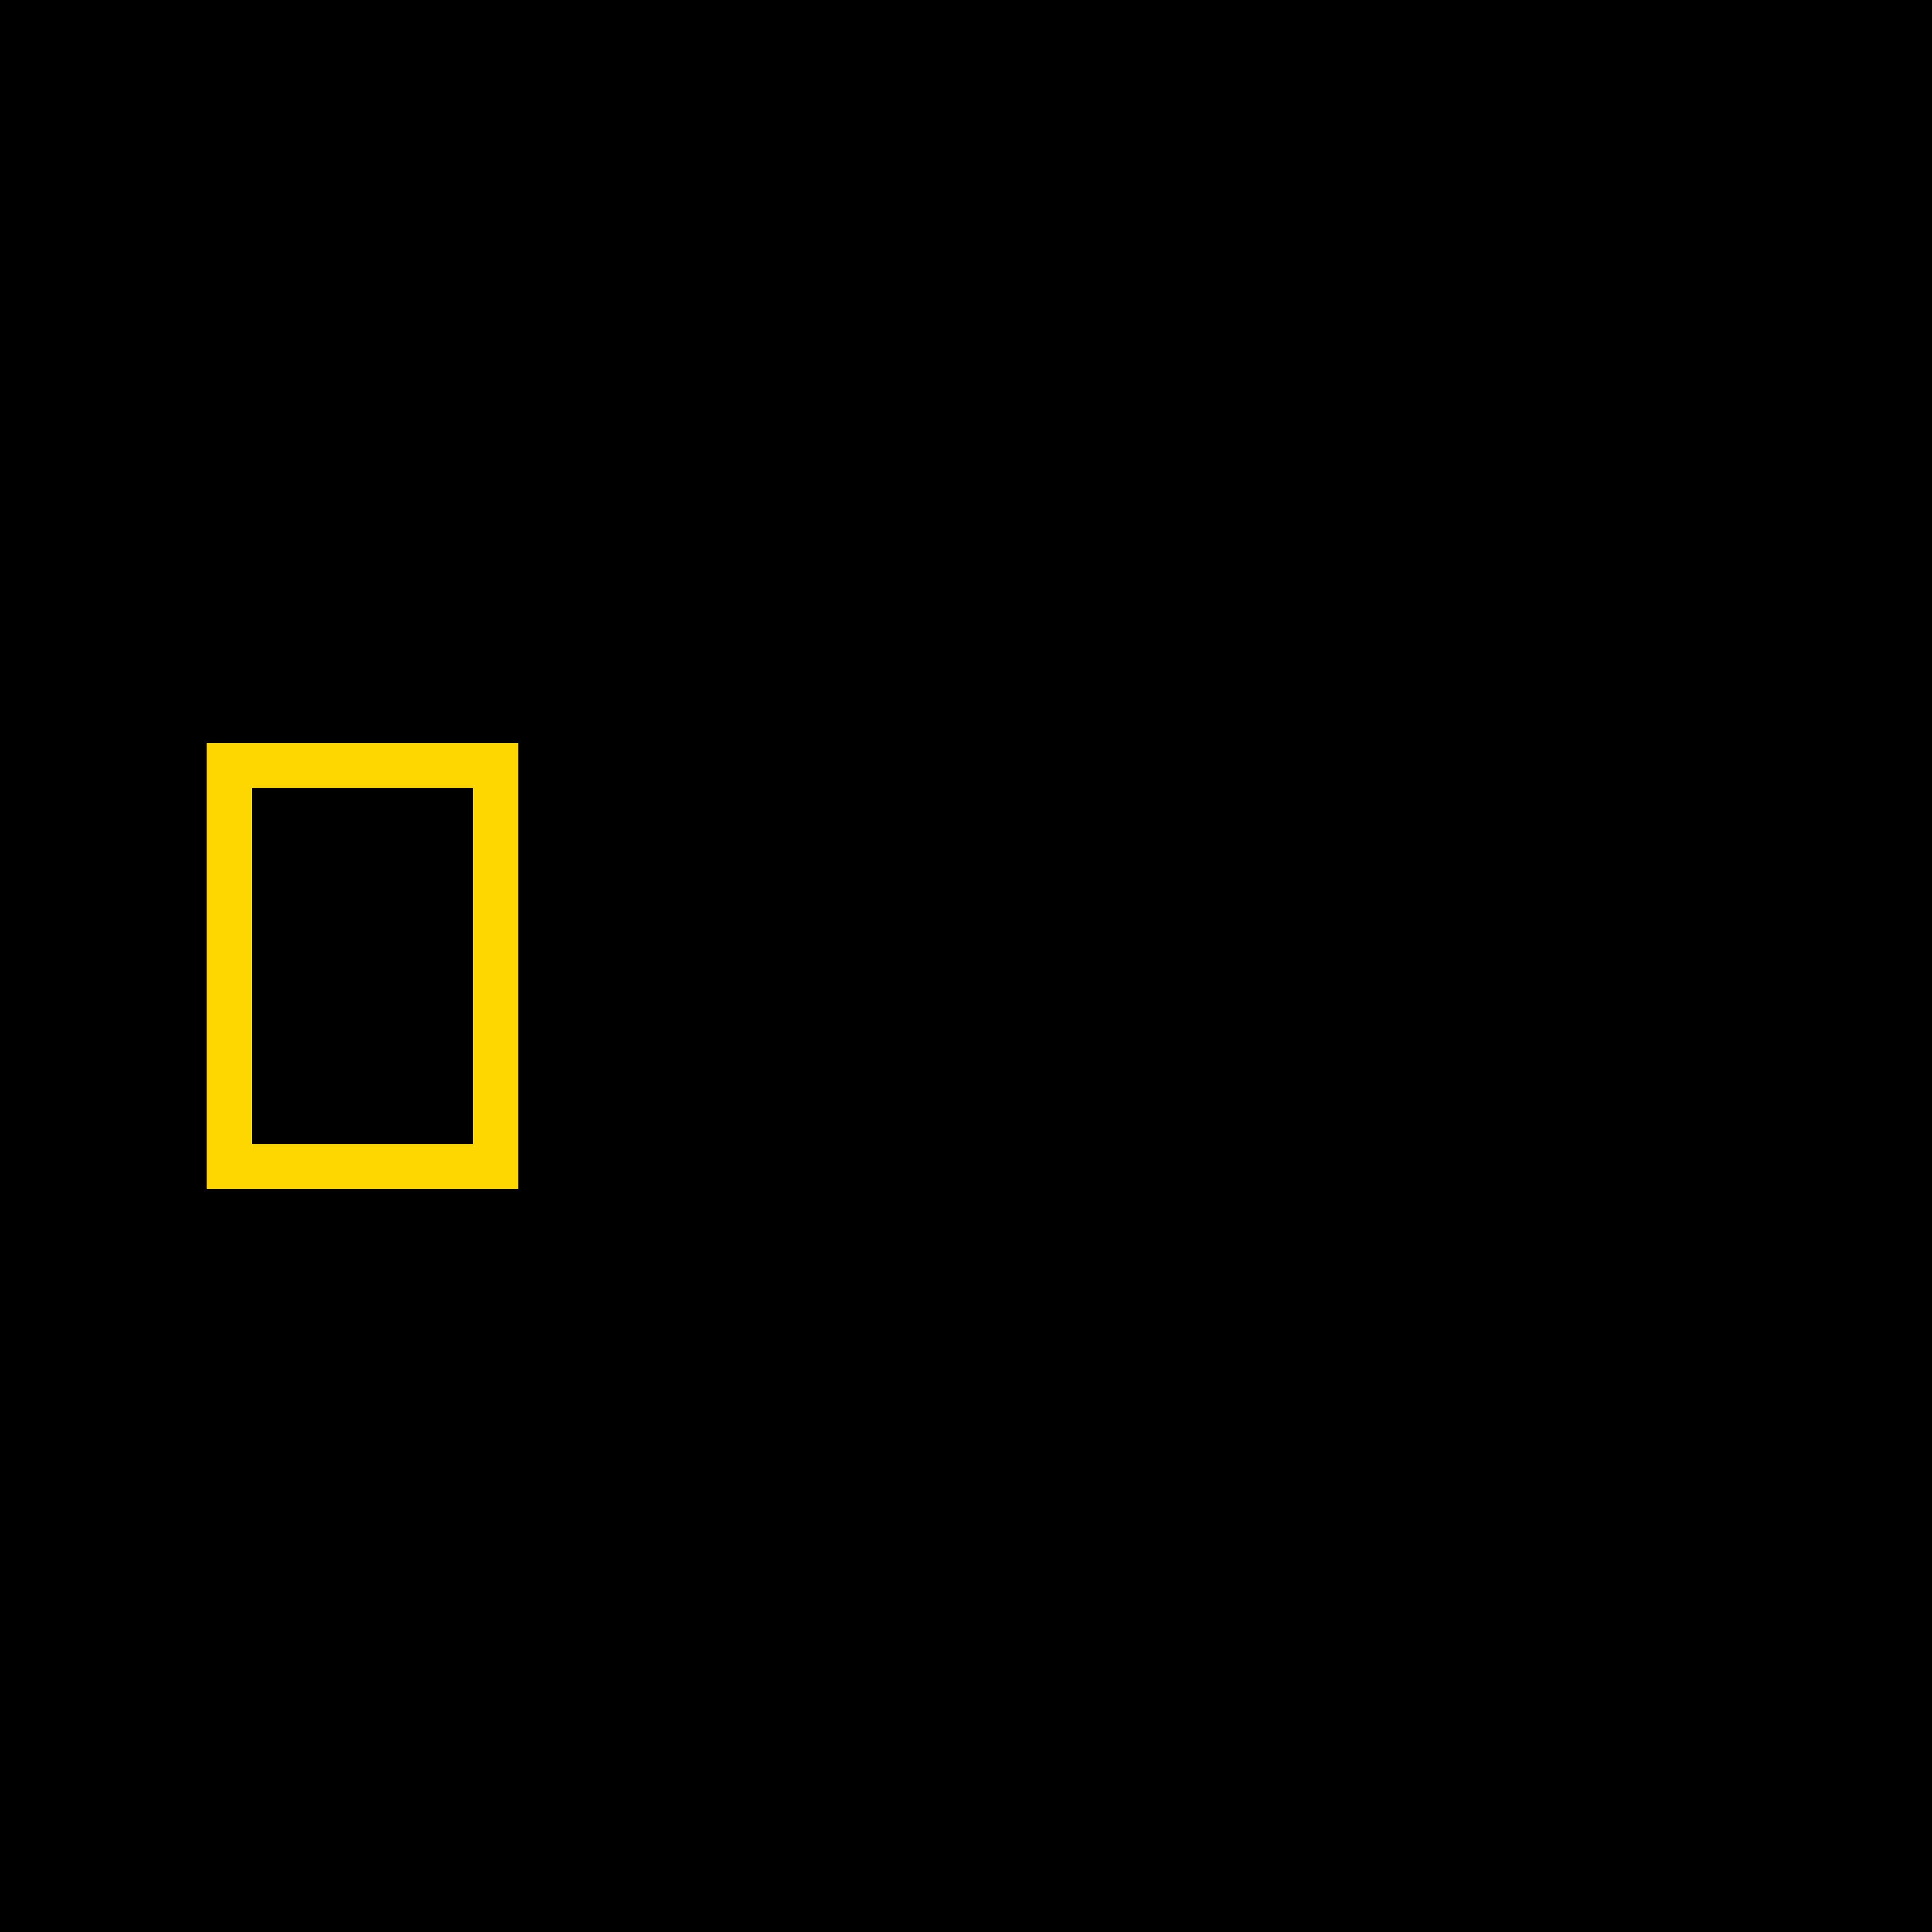 national geographic logo 0 - National Geographic Logo